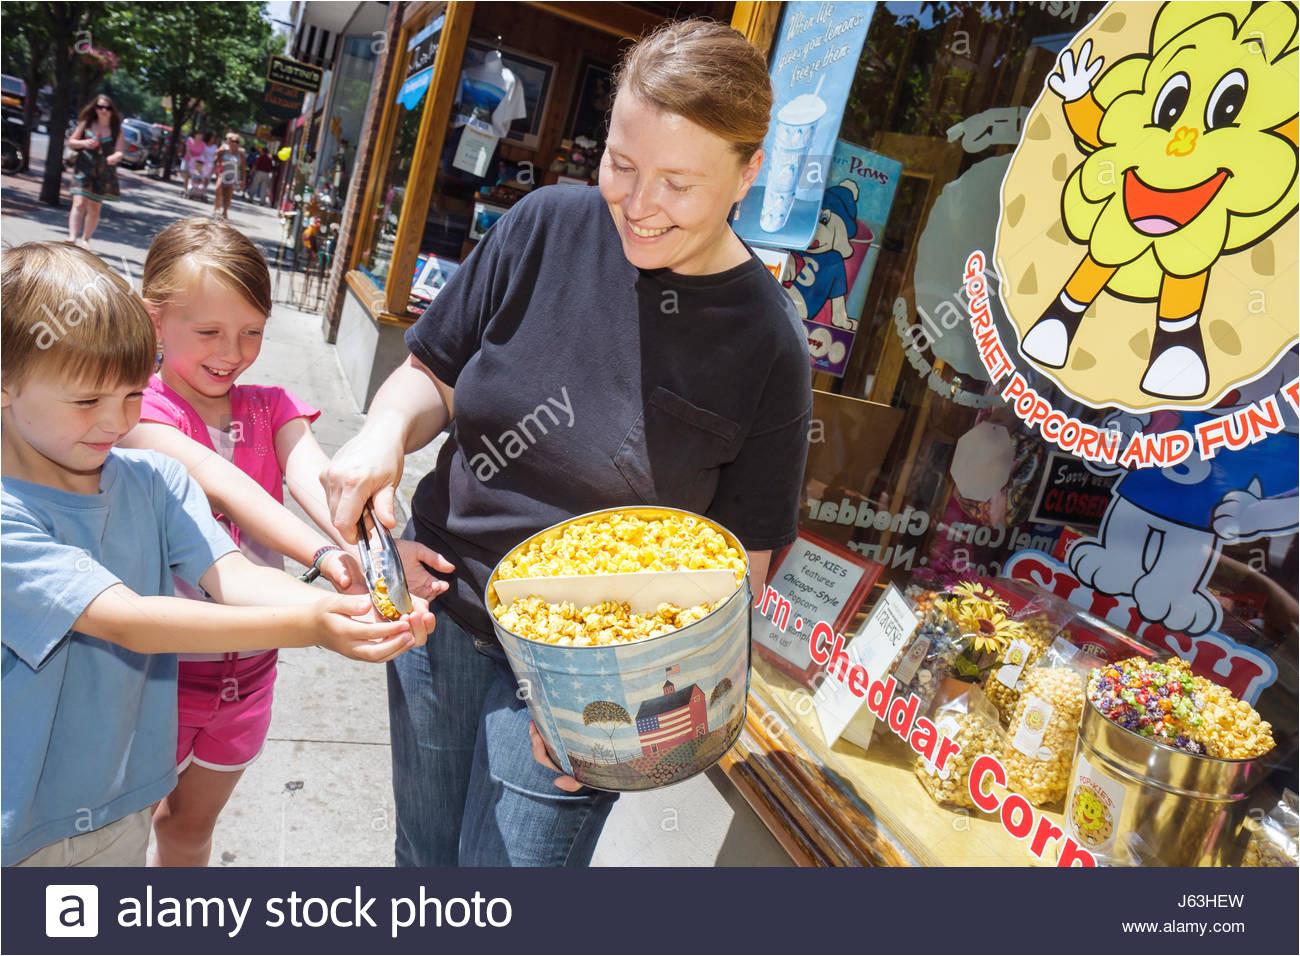 michigan traverse city front street shopping woman girl boy pop kies gourmet popcorn free sample